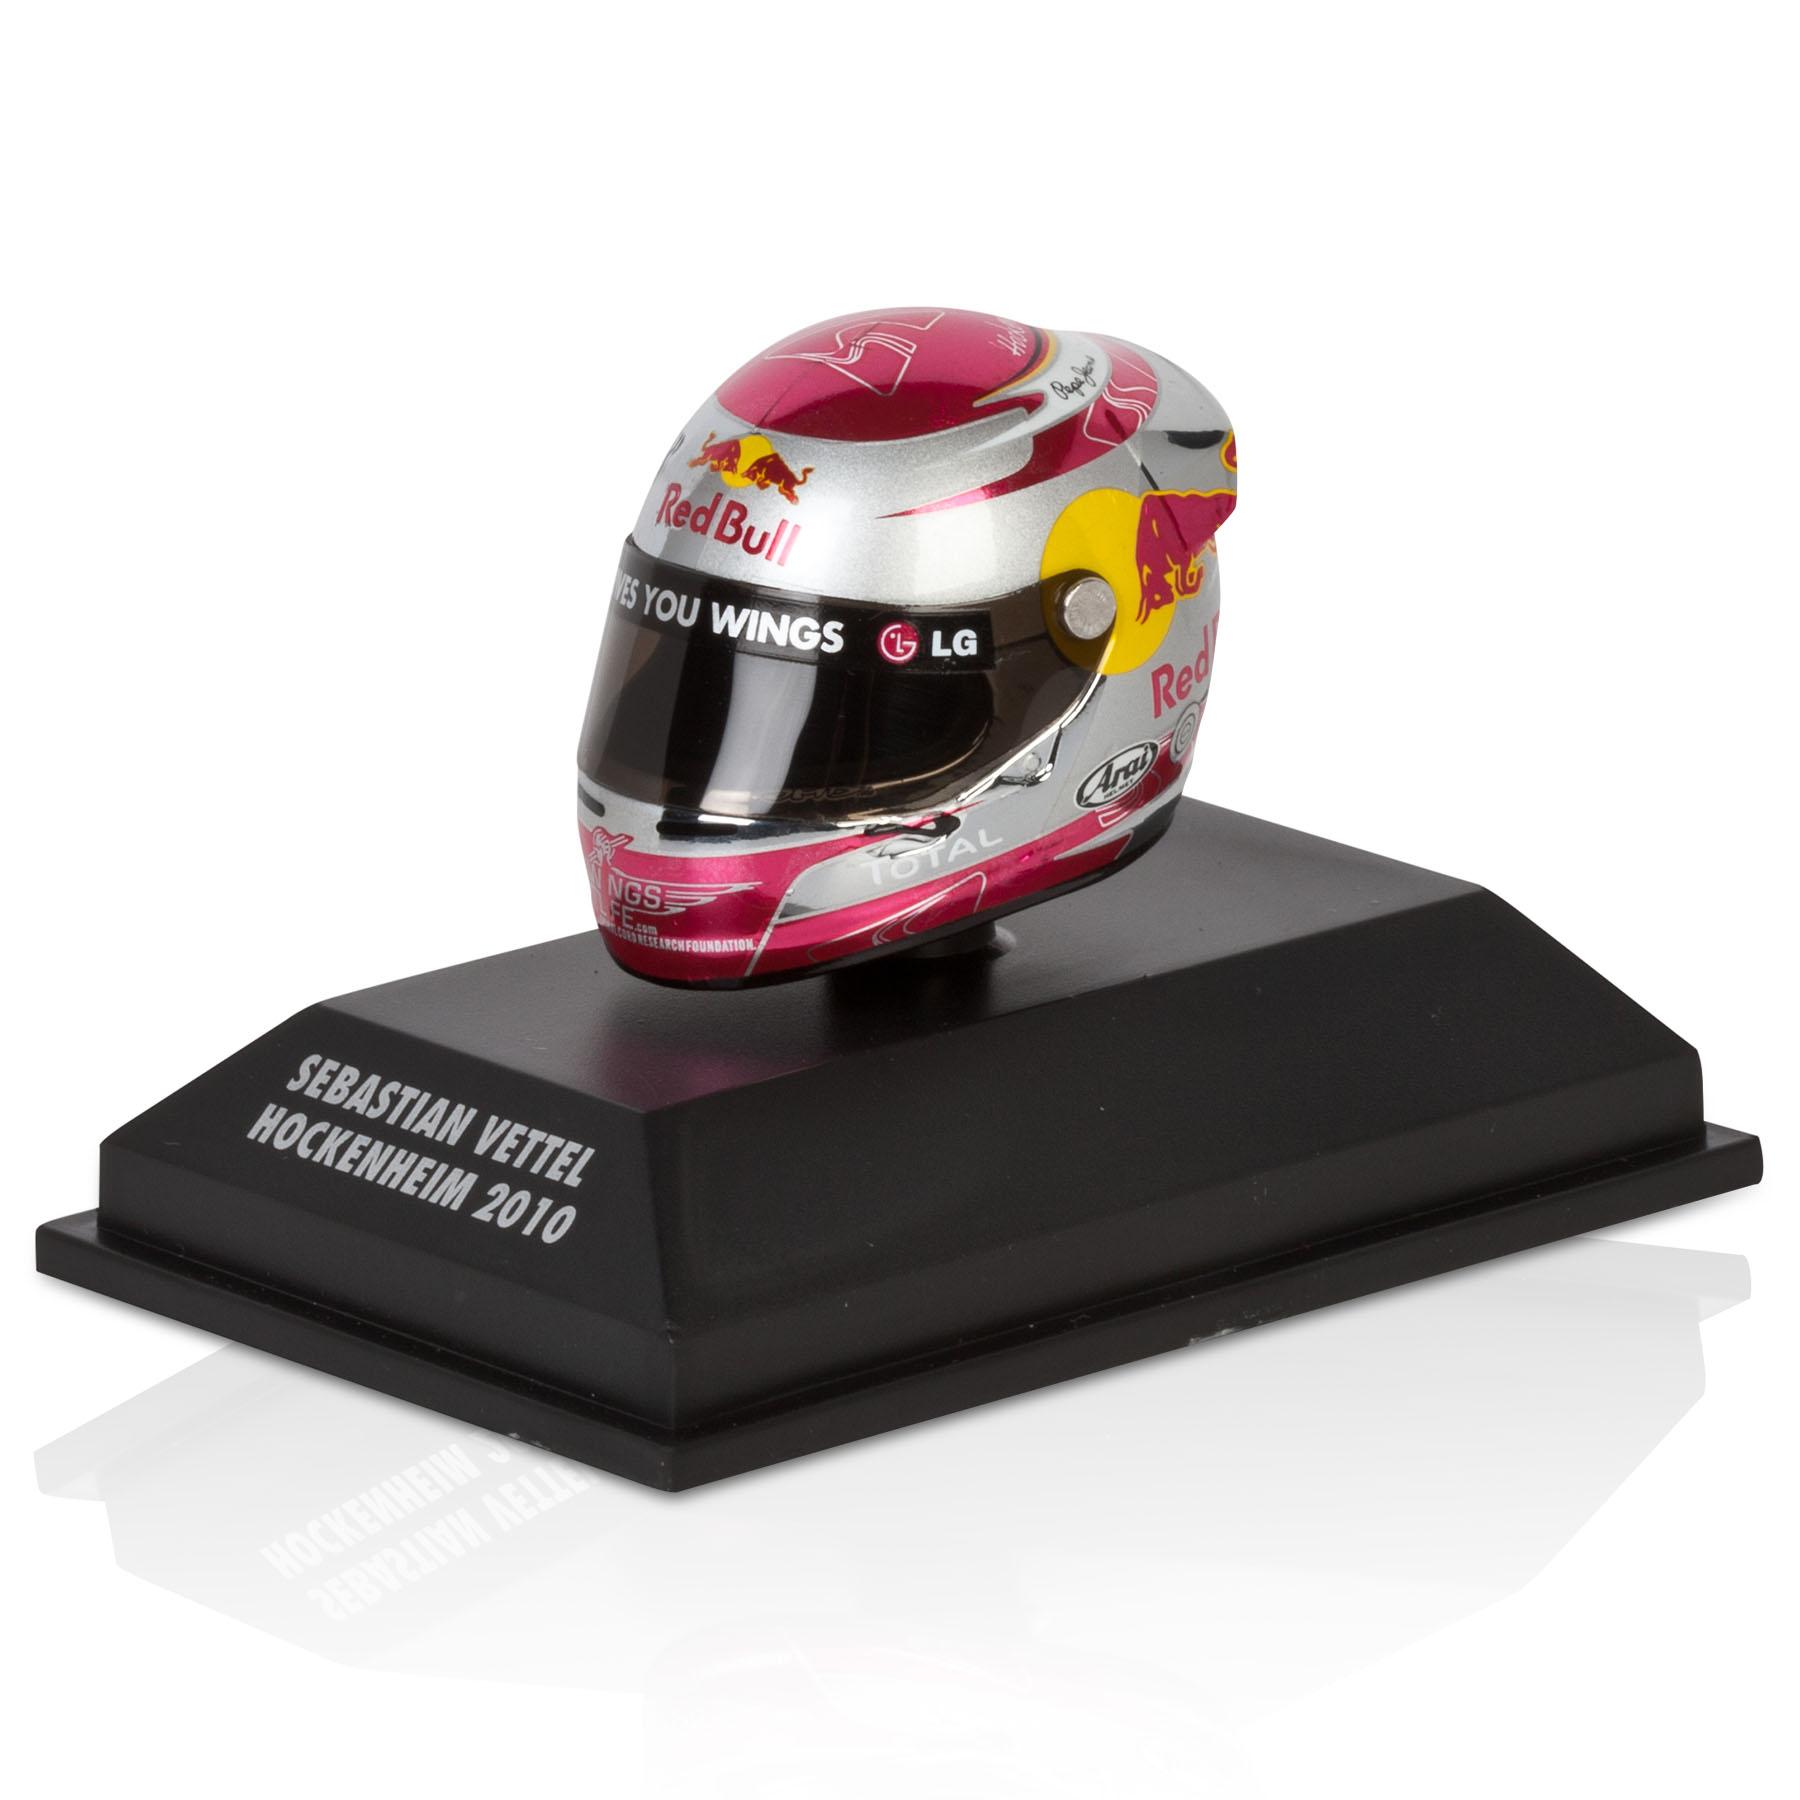 Die Cast Sebastian Vettel - Hockenheim 2010 1:8 Scale Arari Helmet Model Code: 381100305